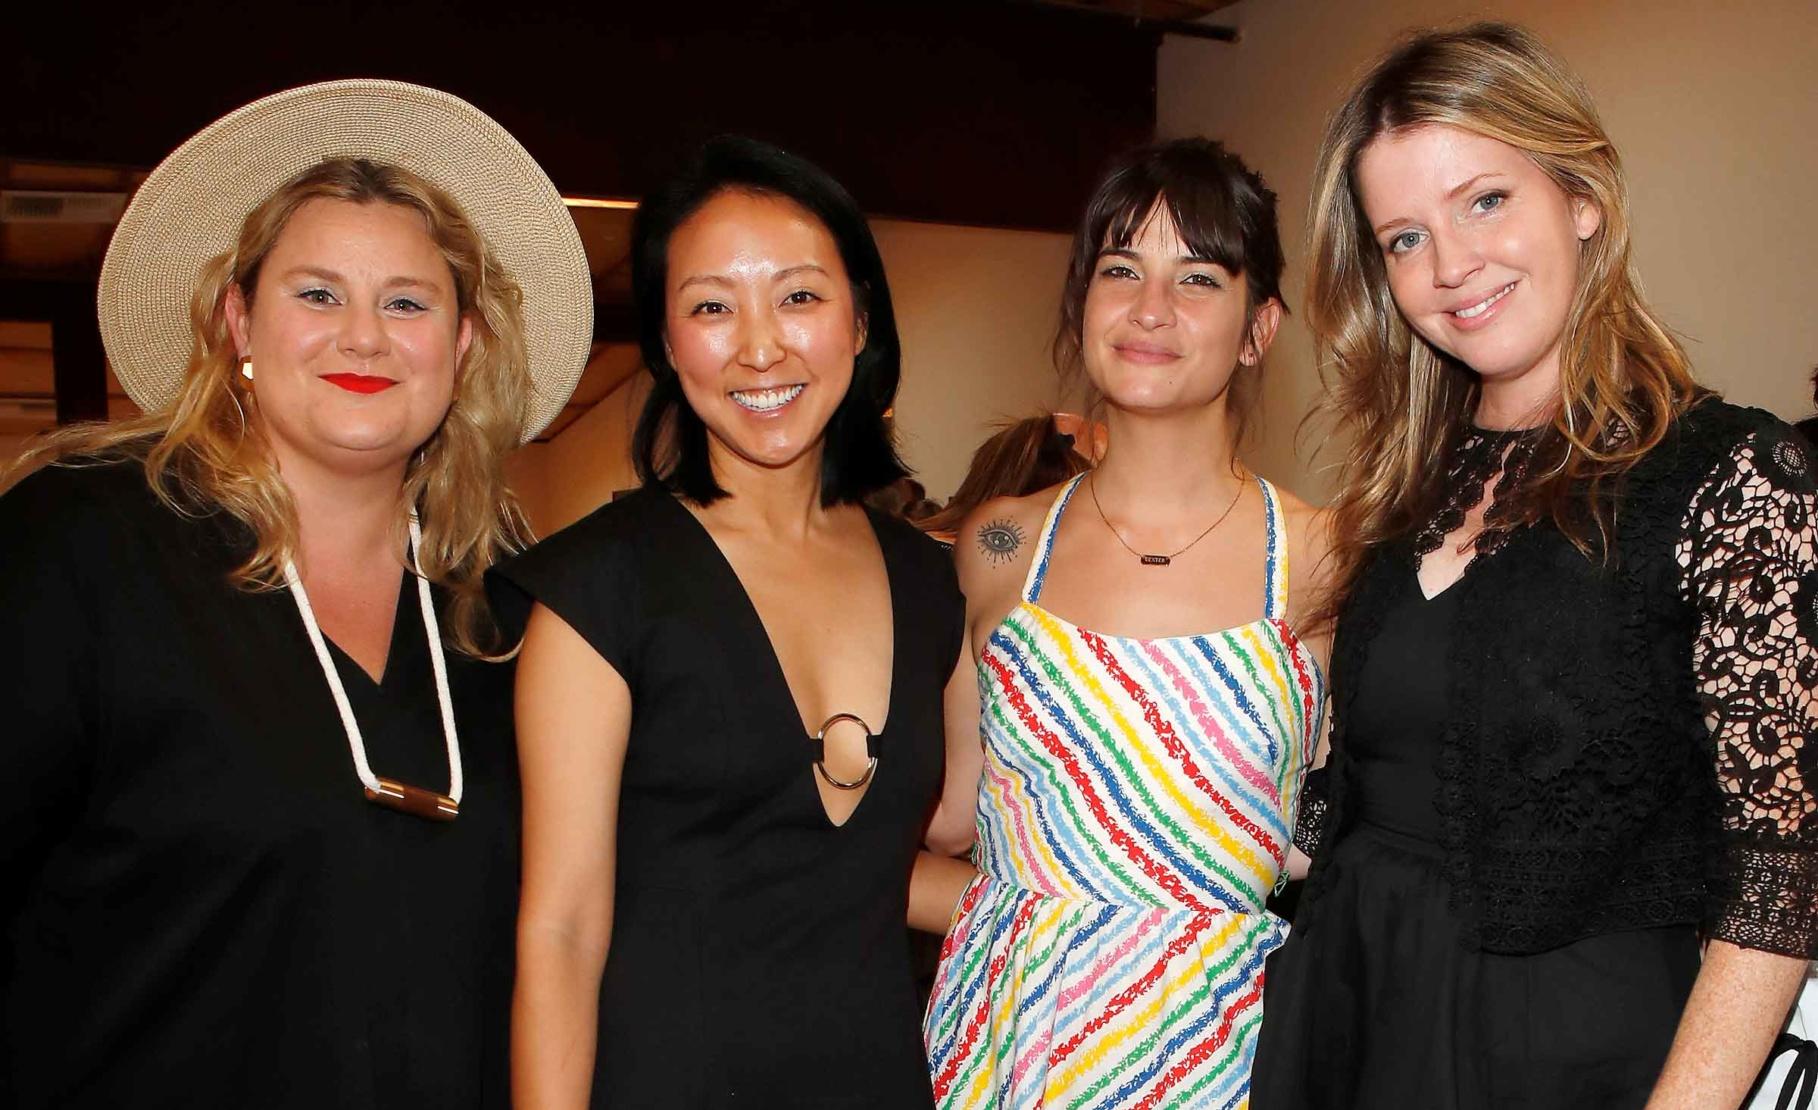 Adrienne Adar, Esther Kim Varet, Melanie Faure and Priscilla Fraser